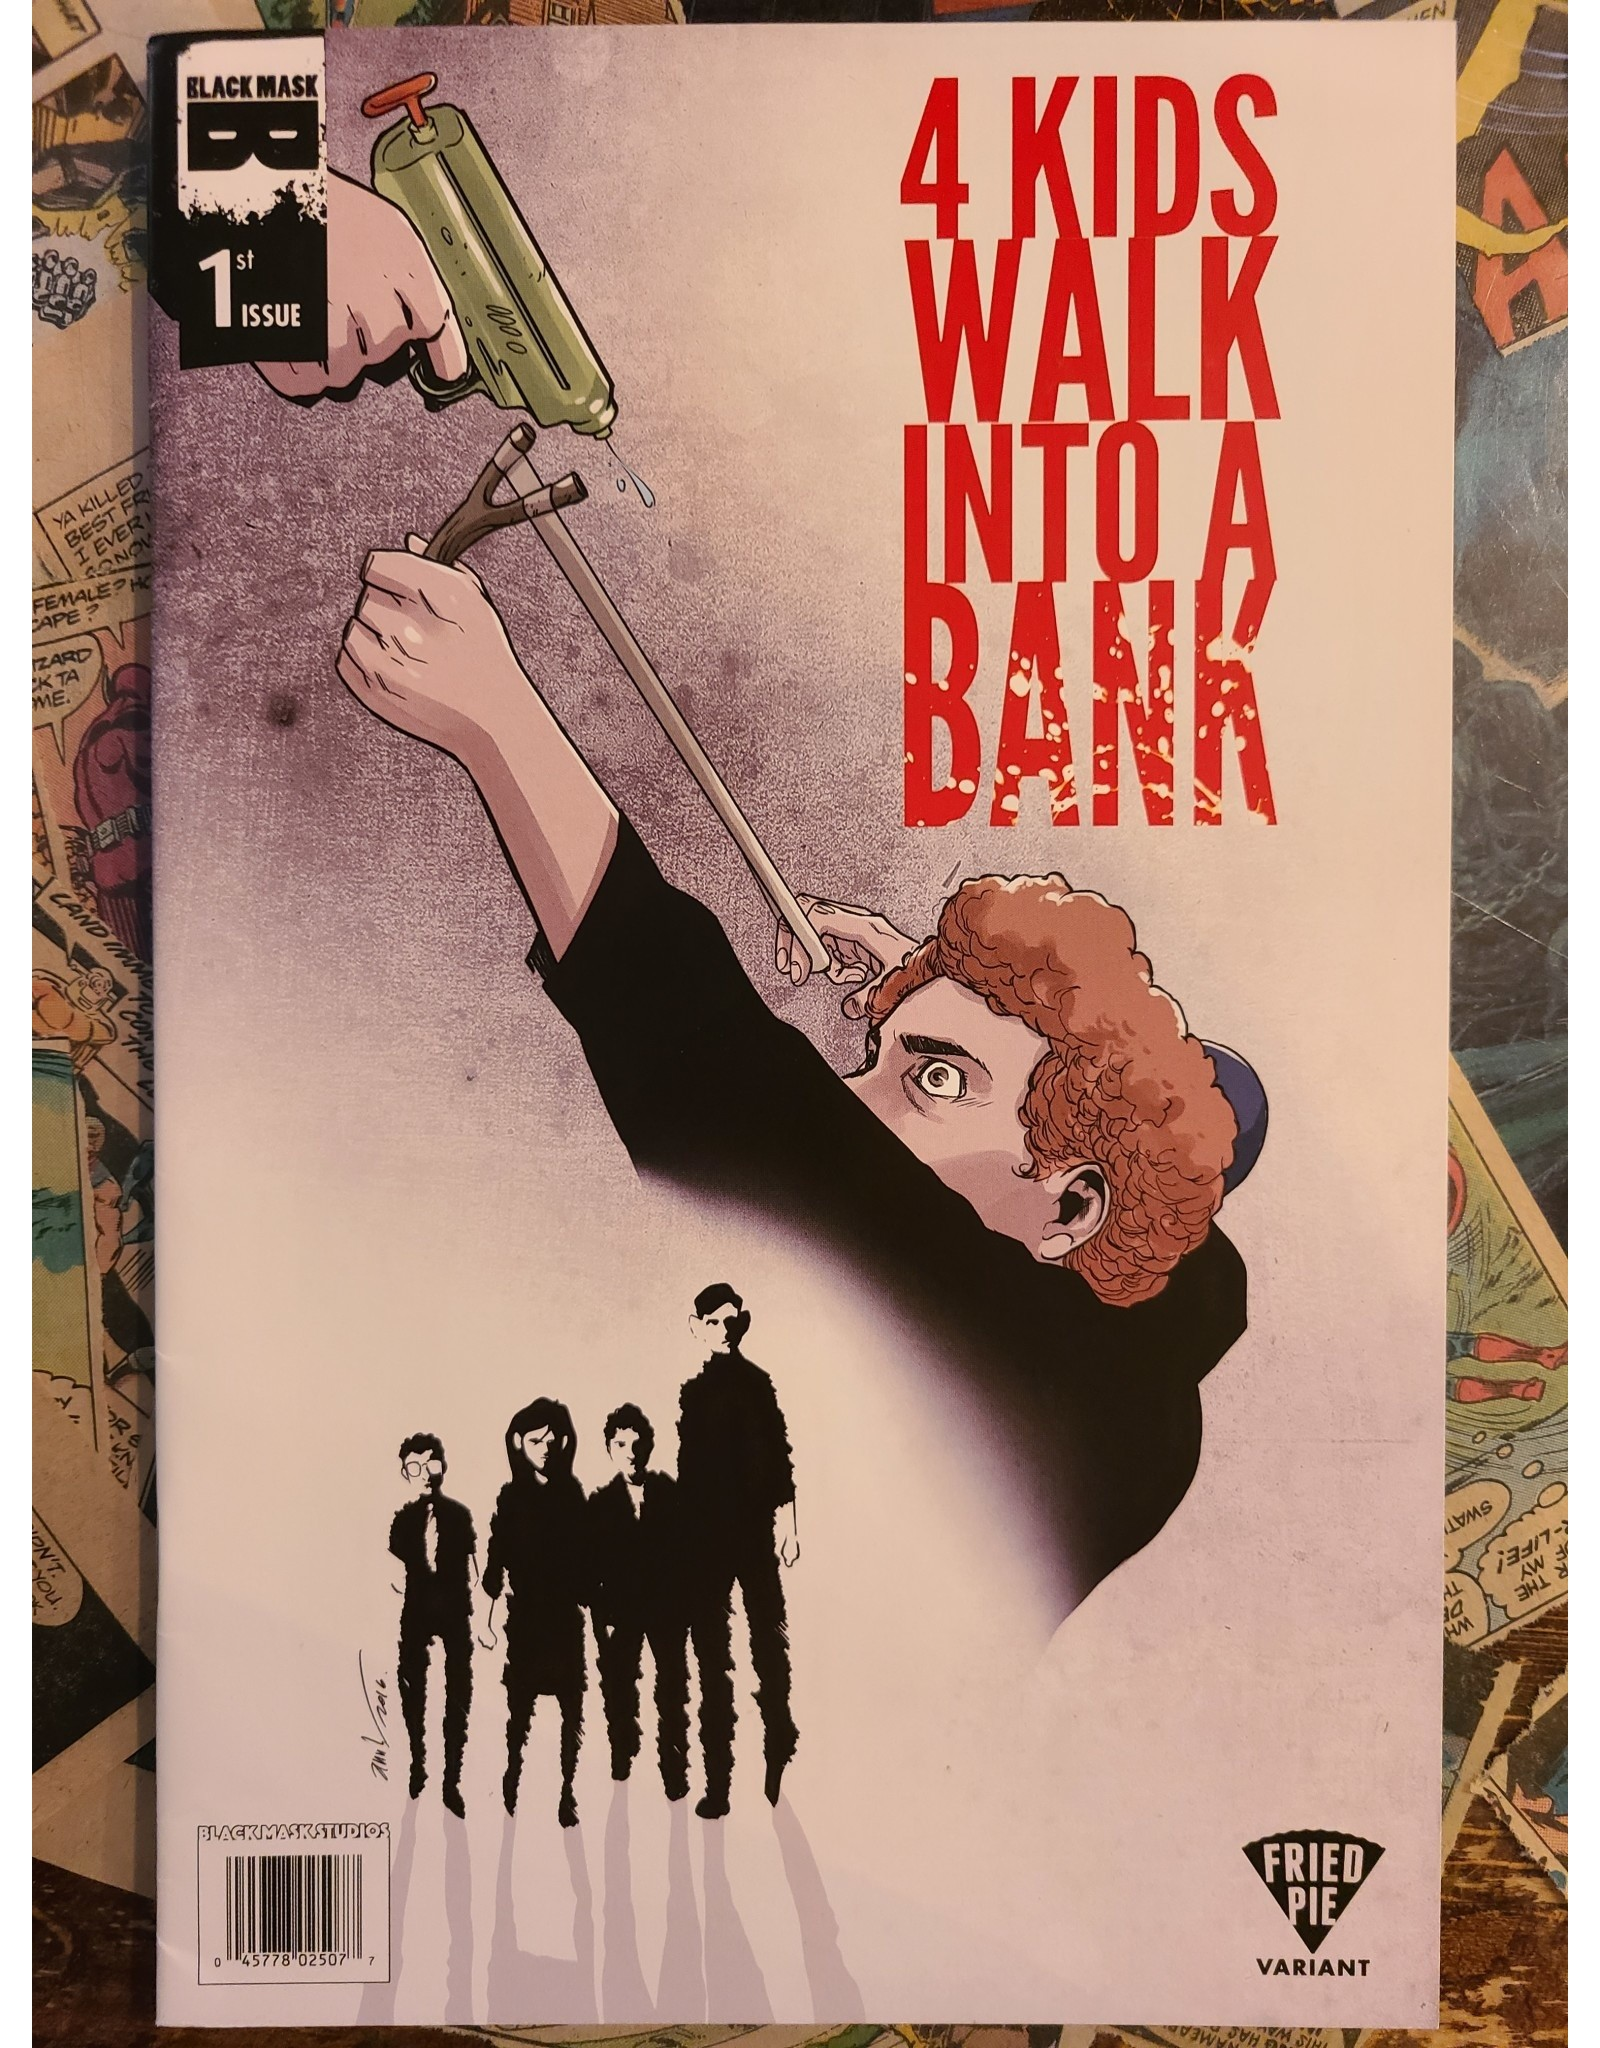 Black Mask 4 KIDS WALK INTO A BANK #1 FRIED PIE EXC